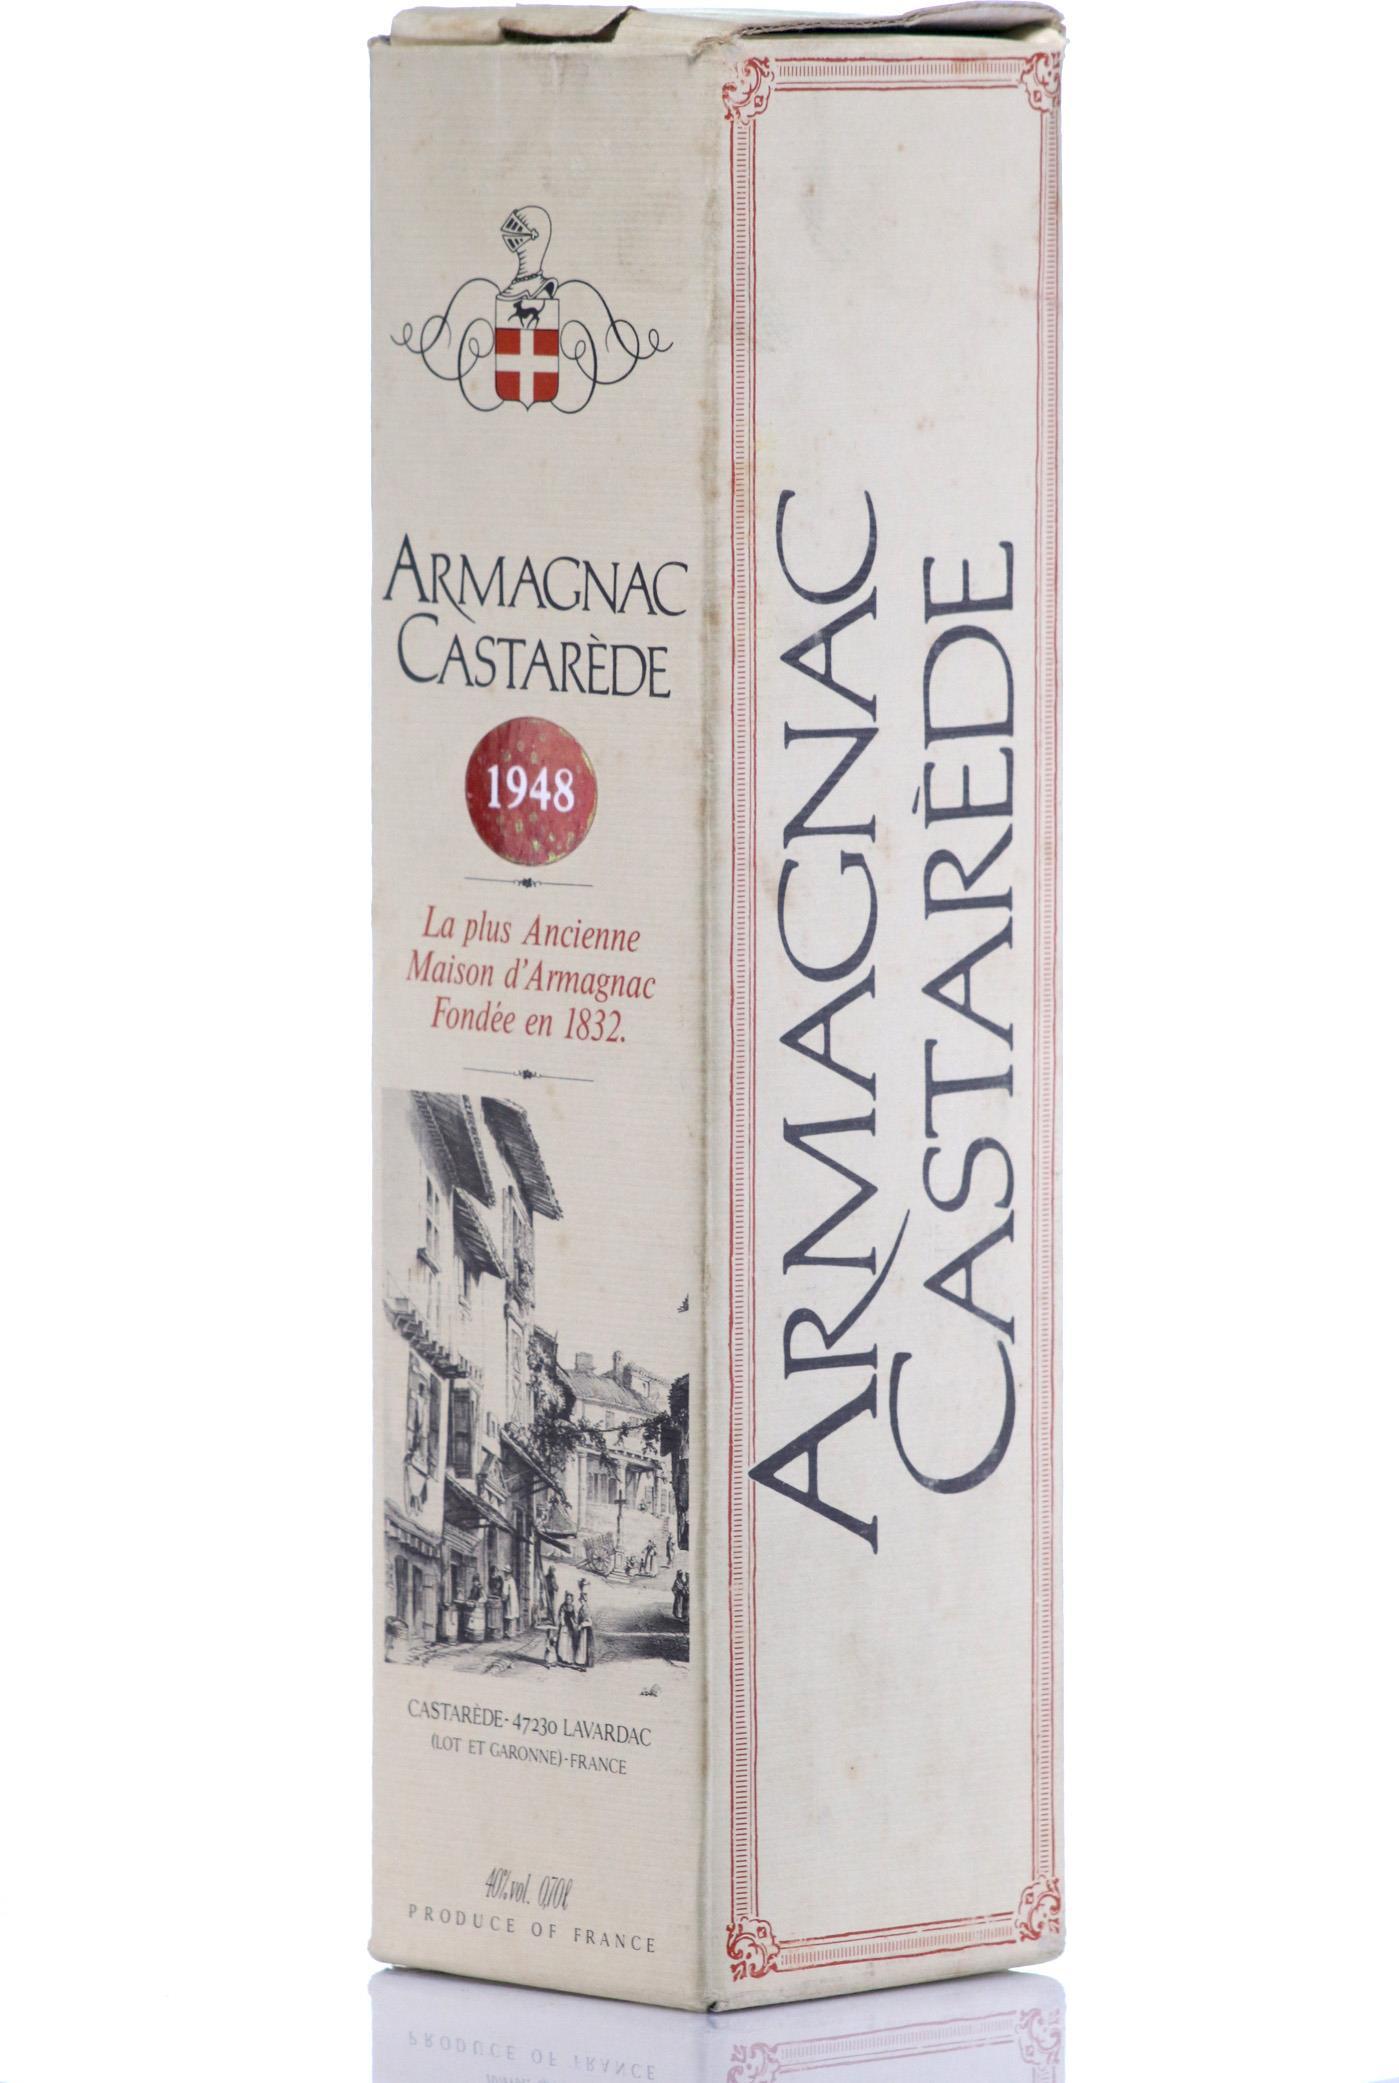 Armagnac 1948 Castarède